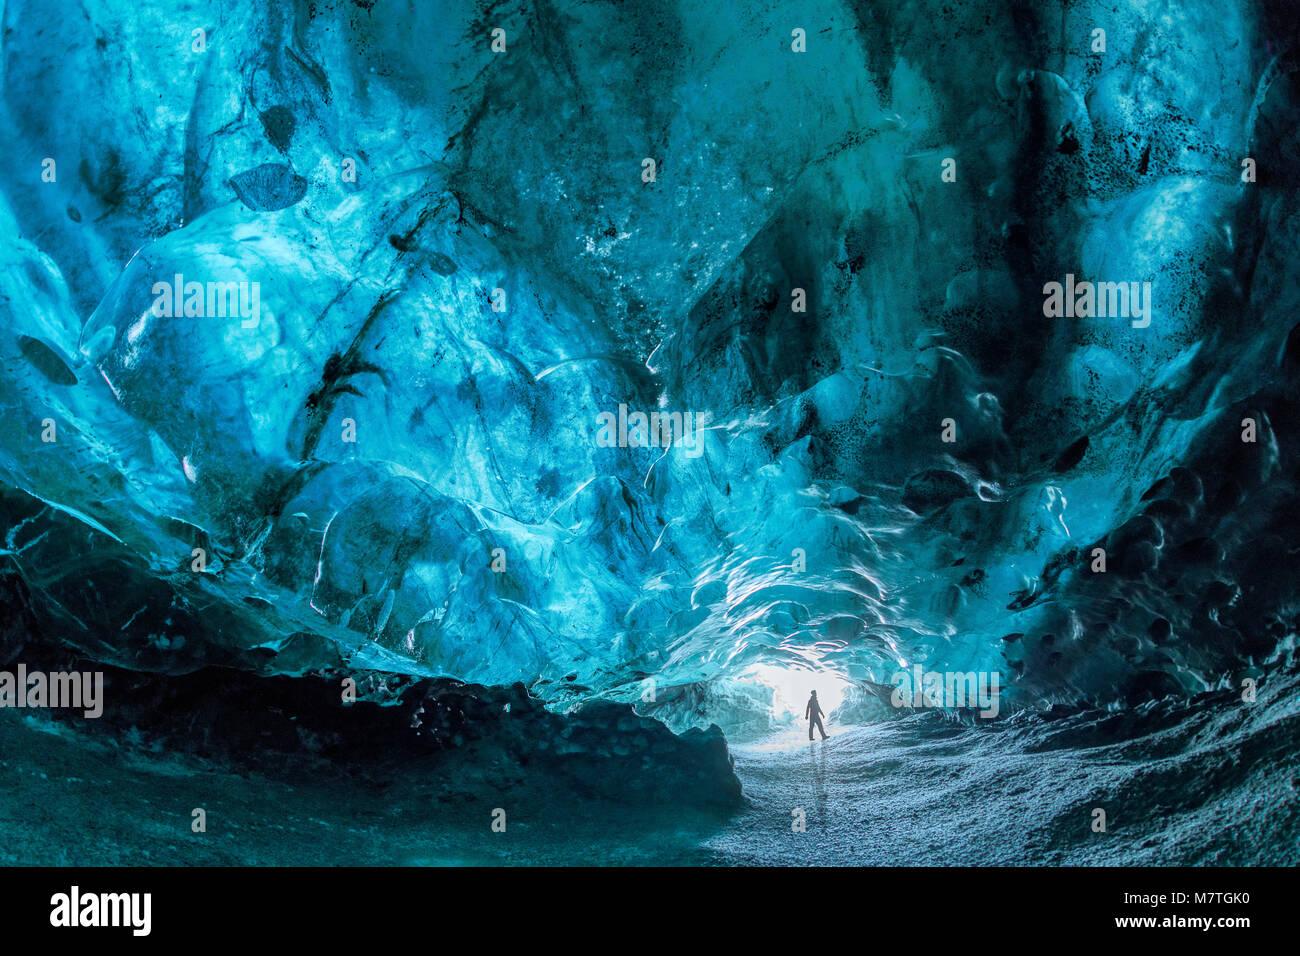 Interior of a blue ice cave at the Vatnajokull Glacier, the largest glacier in Europe, near Jokulsarlon, Iceland Stock Photo